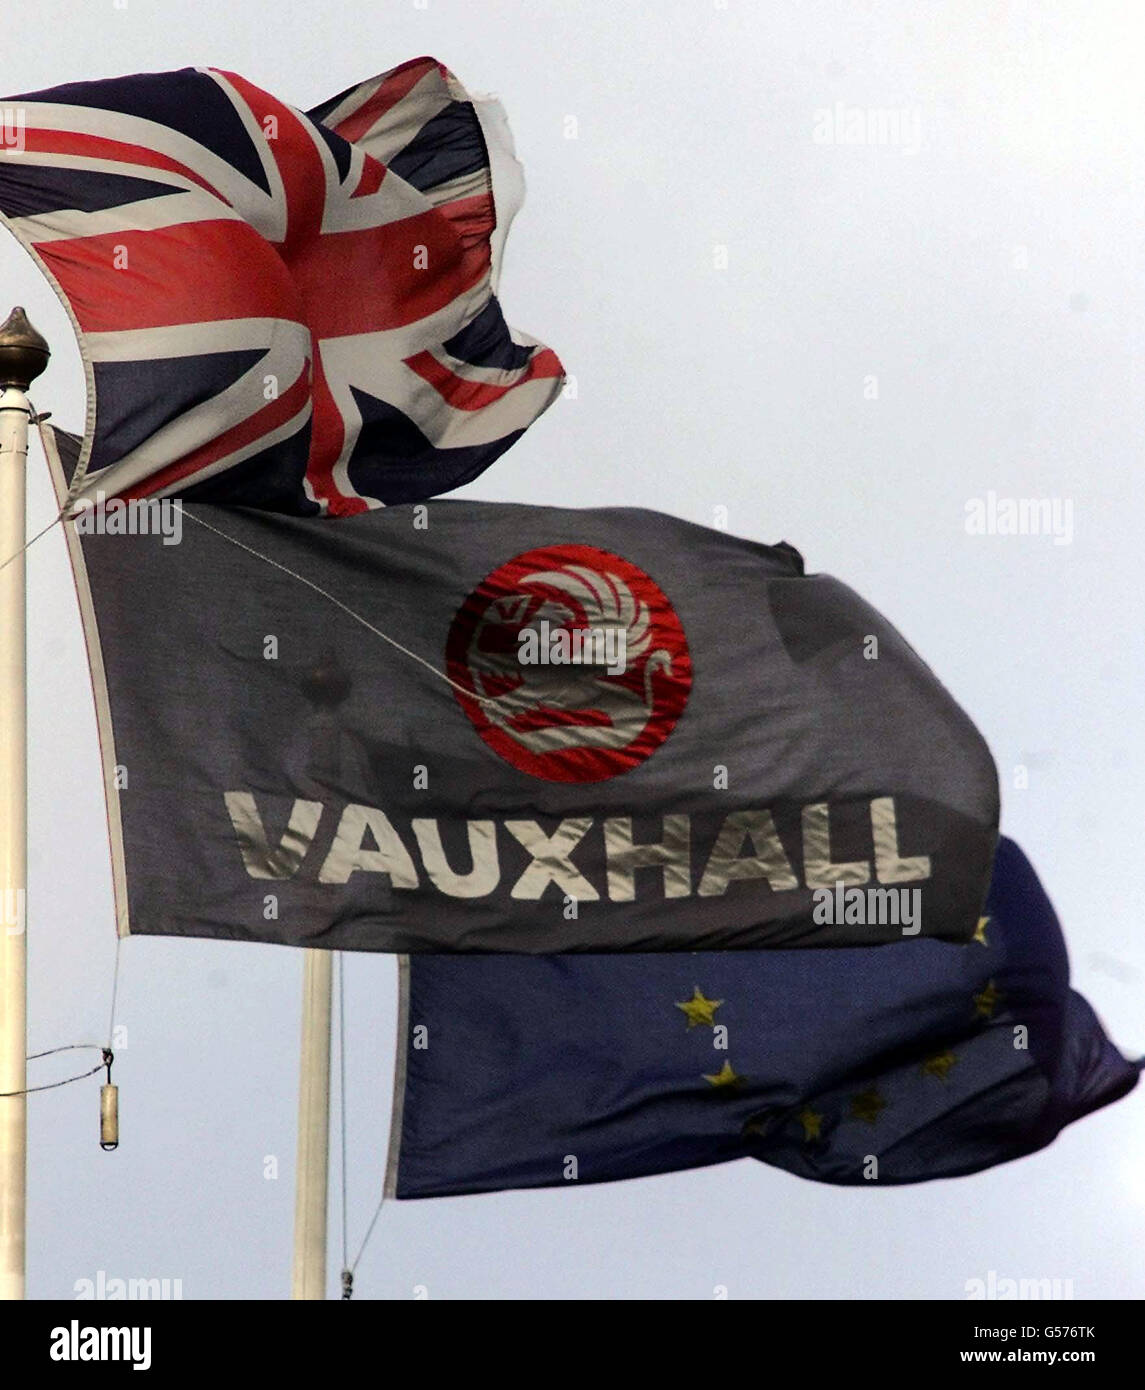 Vauxhall job losses HQ - Stock Image